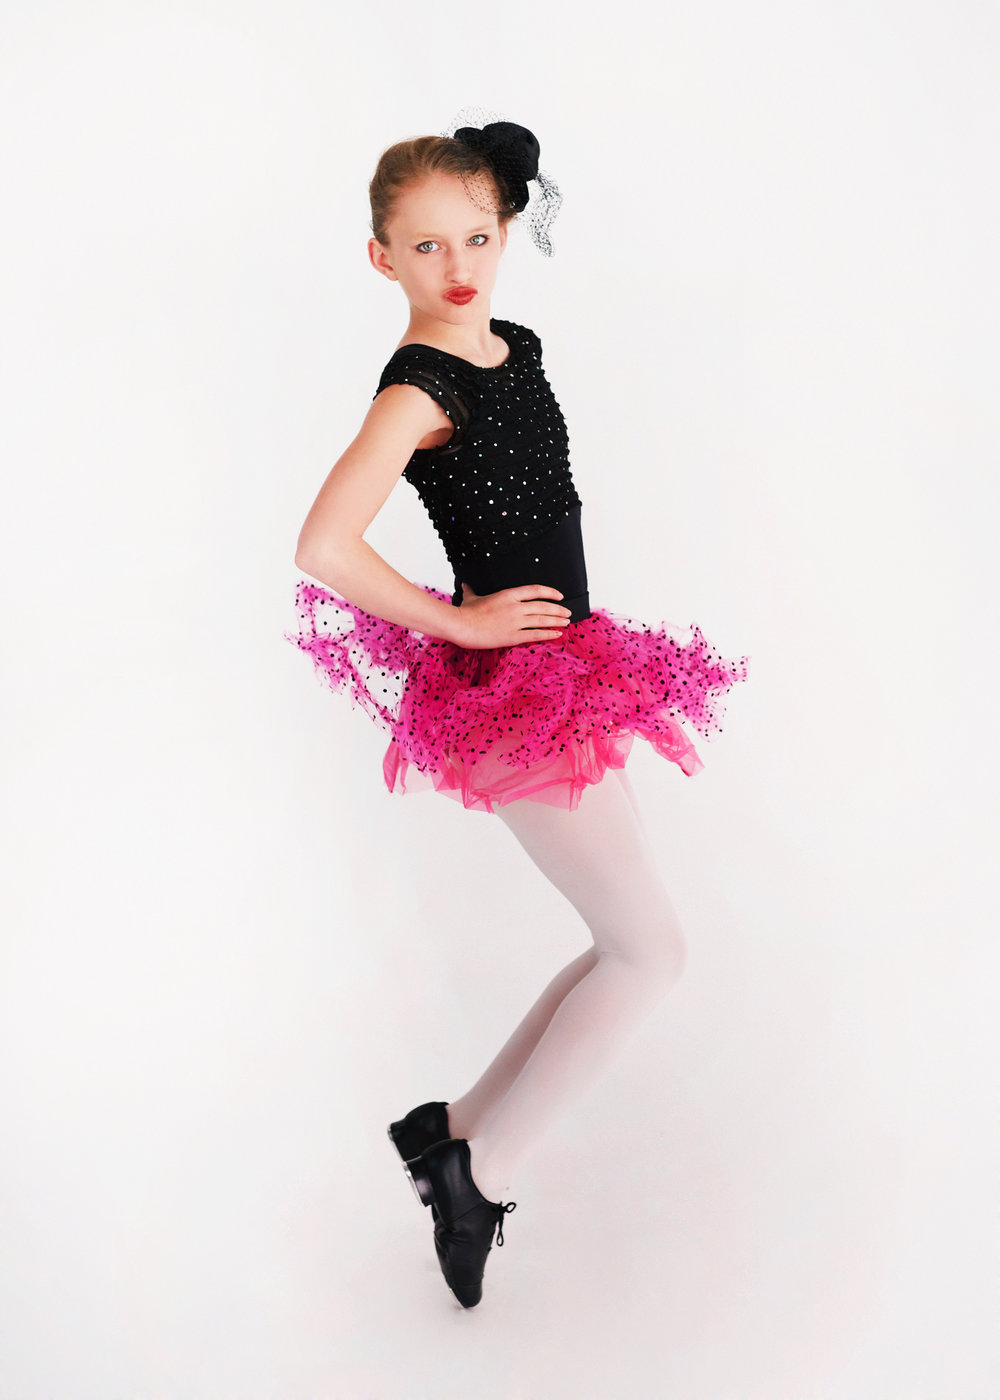 dance poses 085.jpg